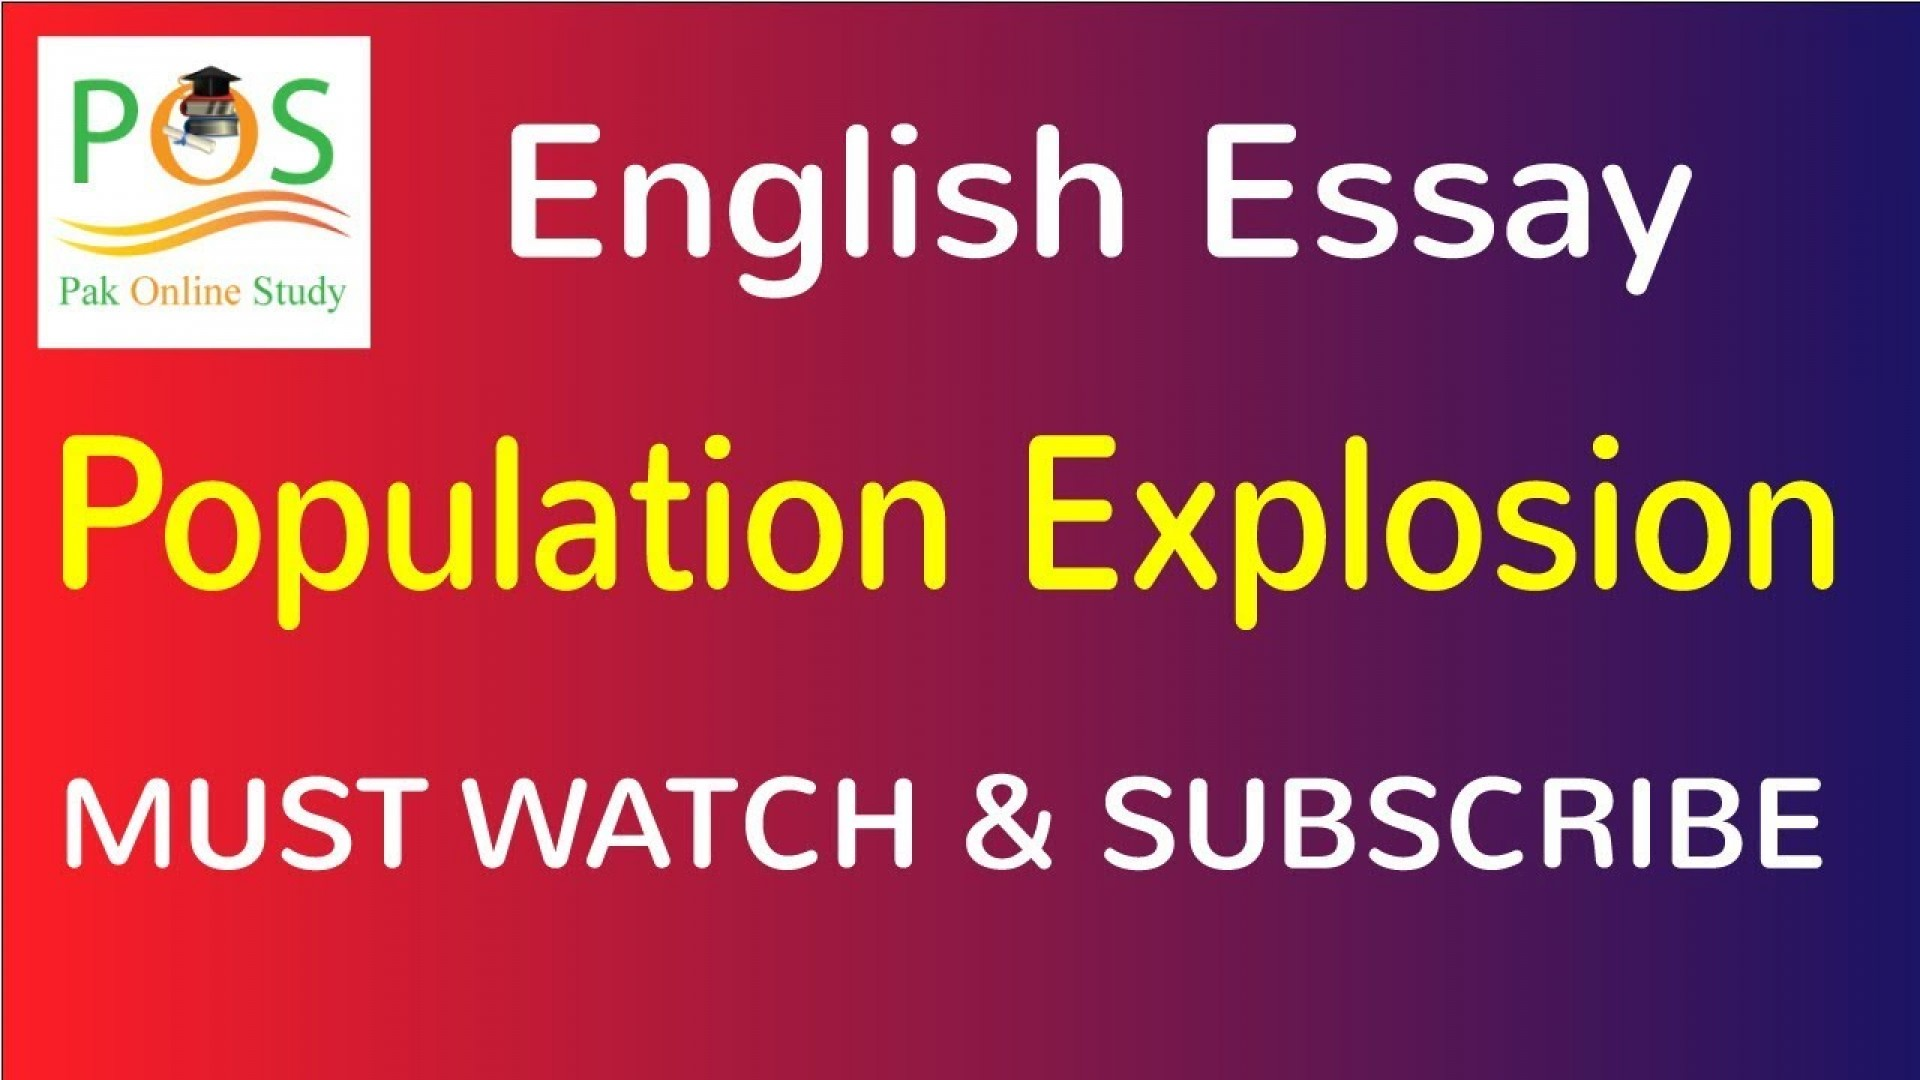 021 Essay On Population Example Impressive Control Explosion In Kannada Pakistan 1920